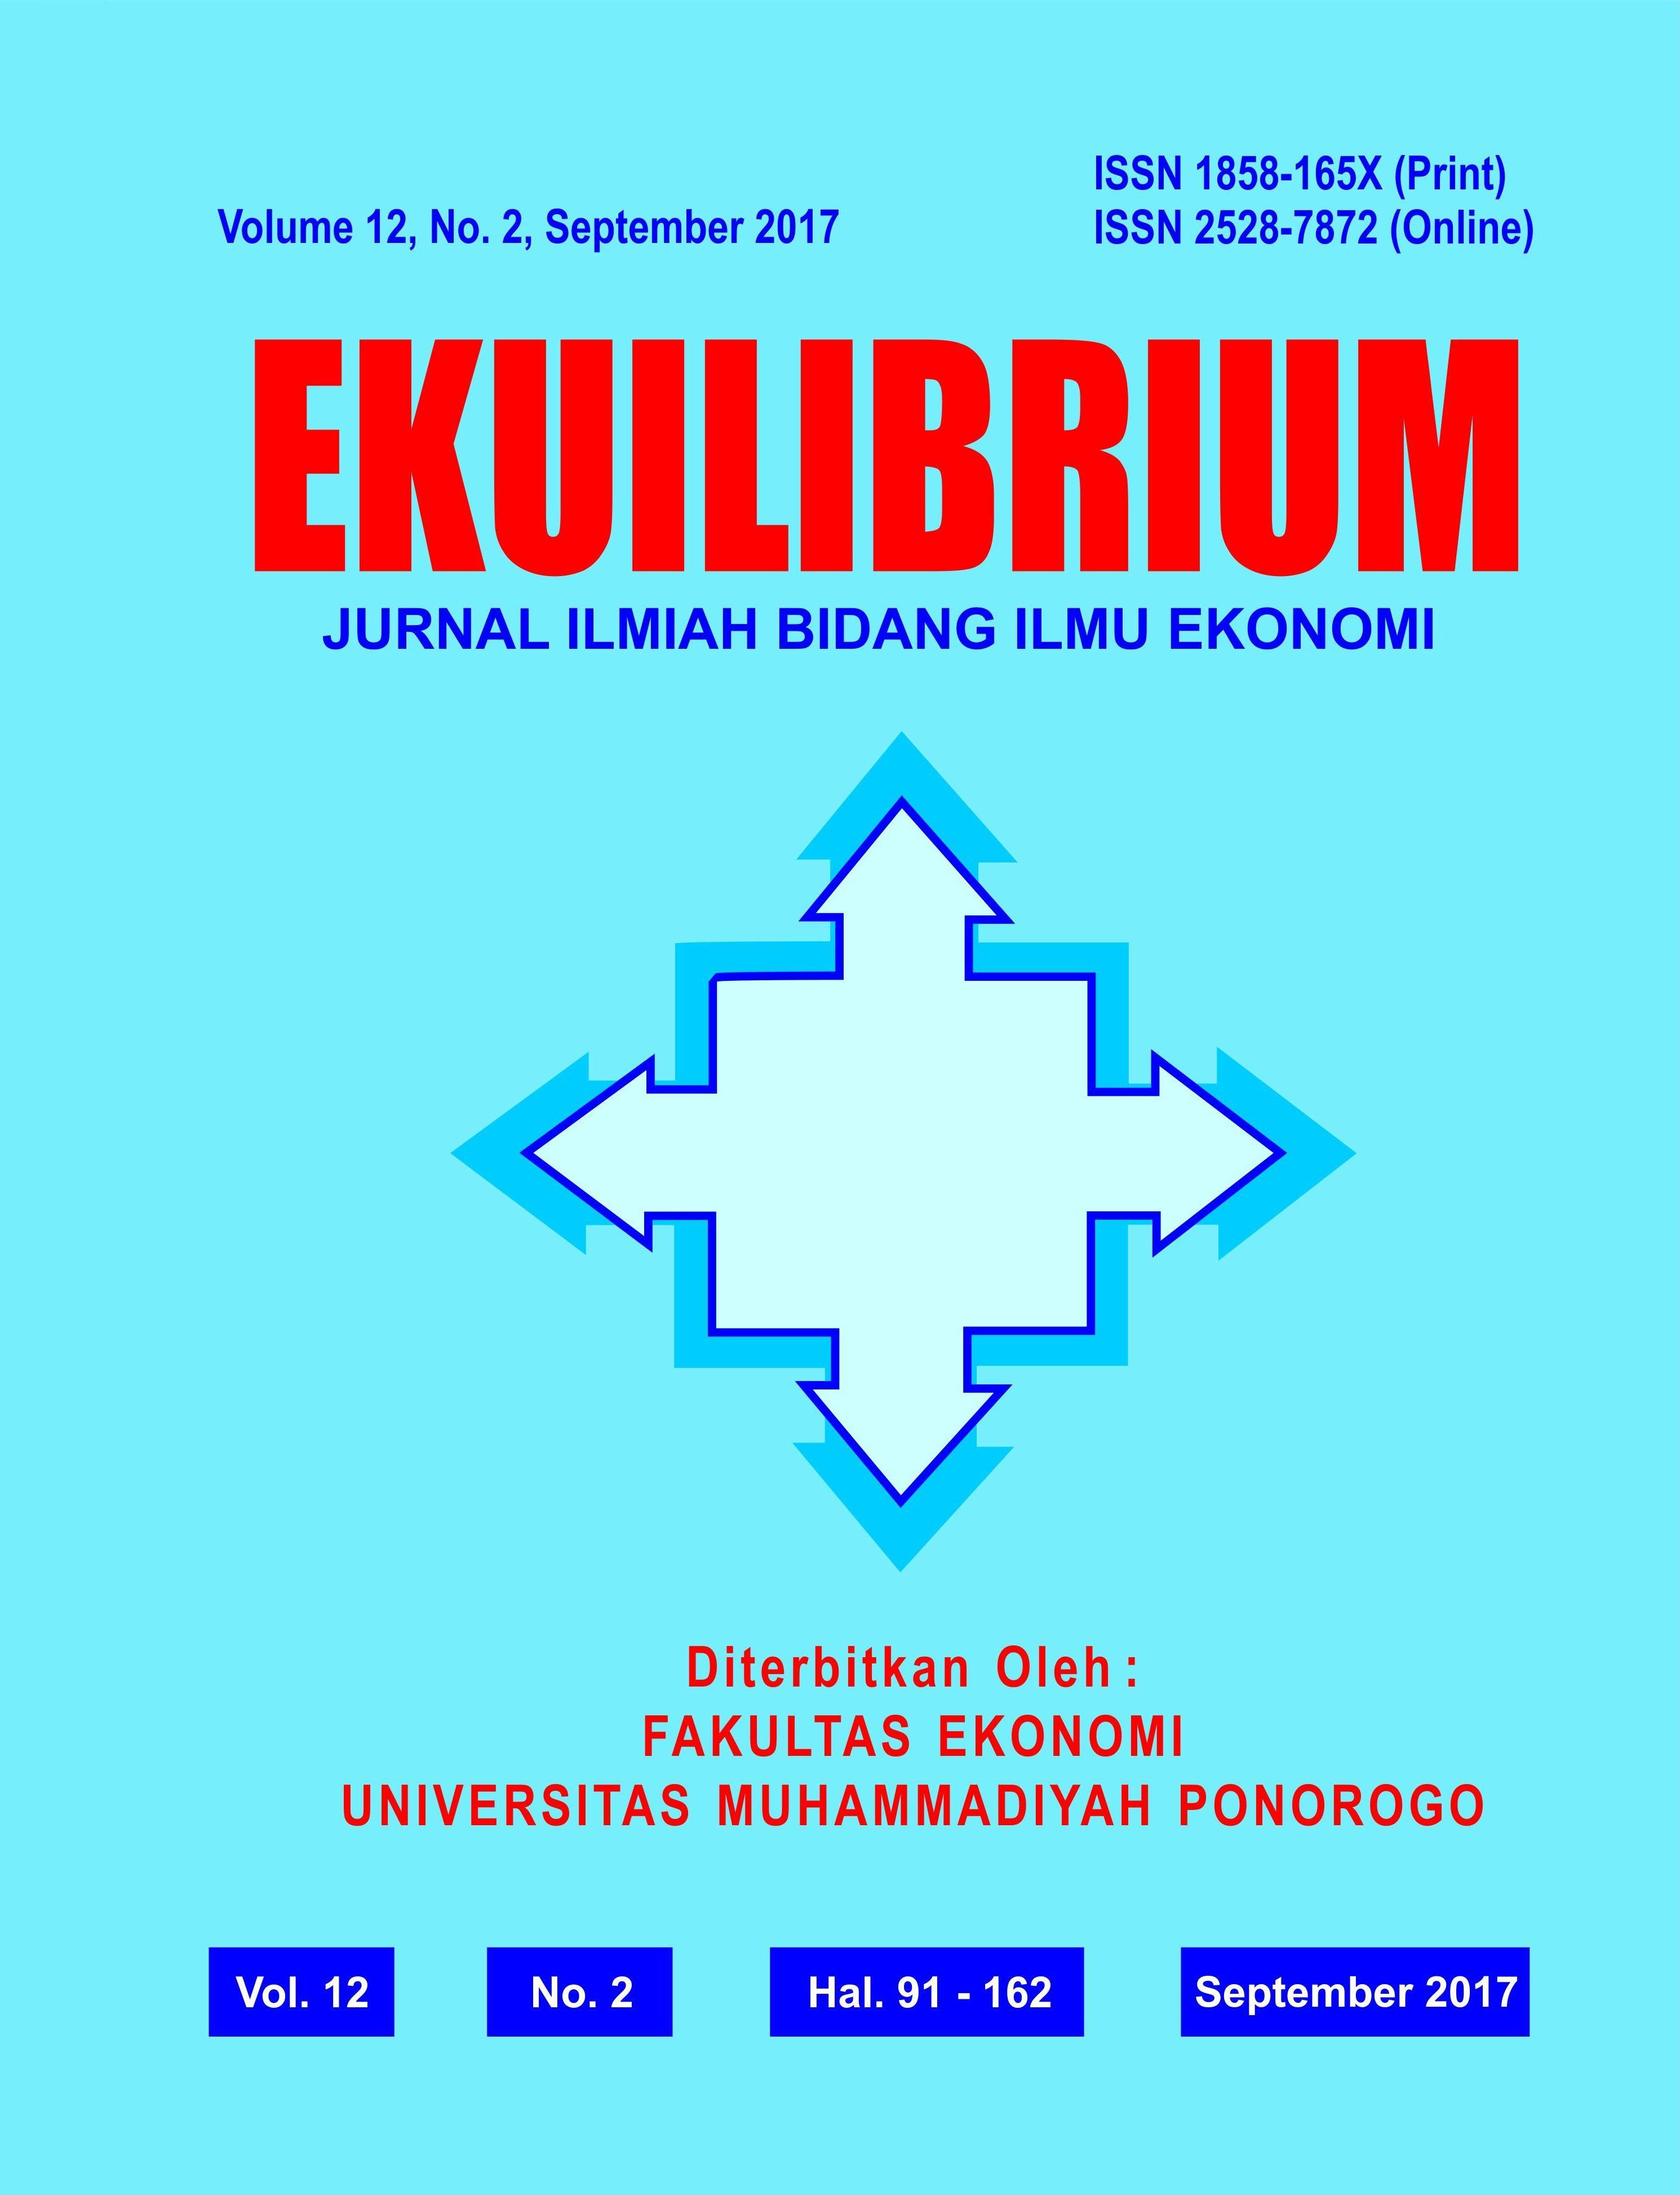 JURNAL EKUILIBRIUM: JURNAL ILMIAH  ILMU EKONOMI